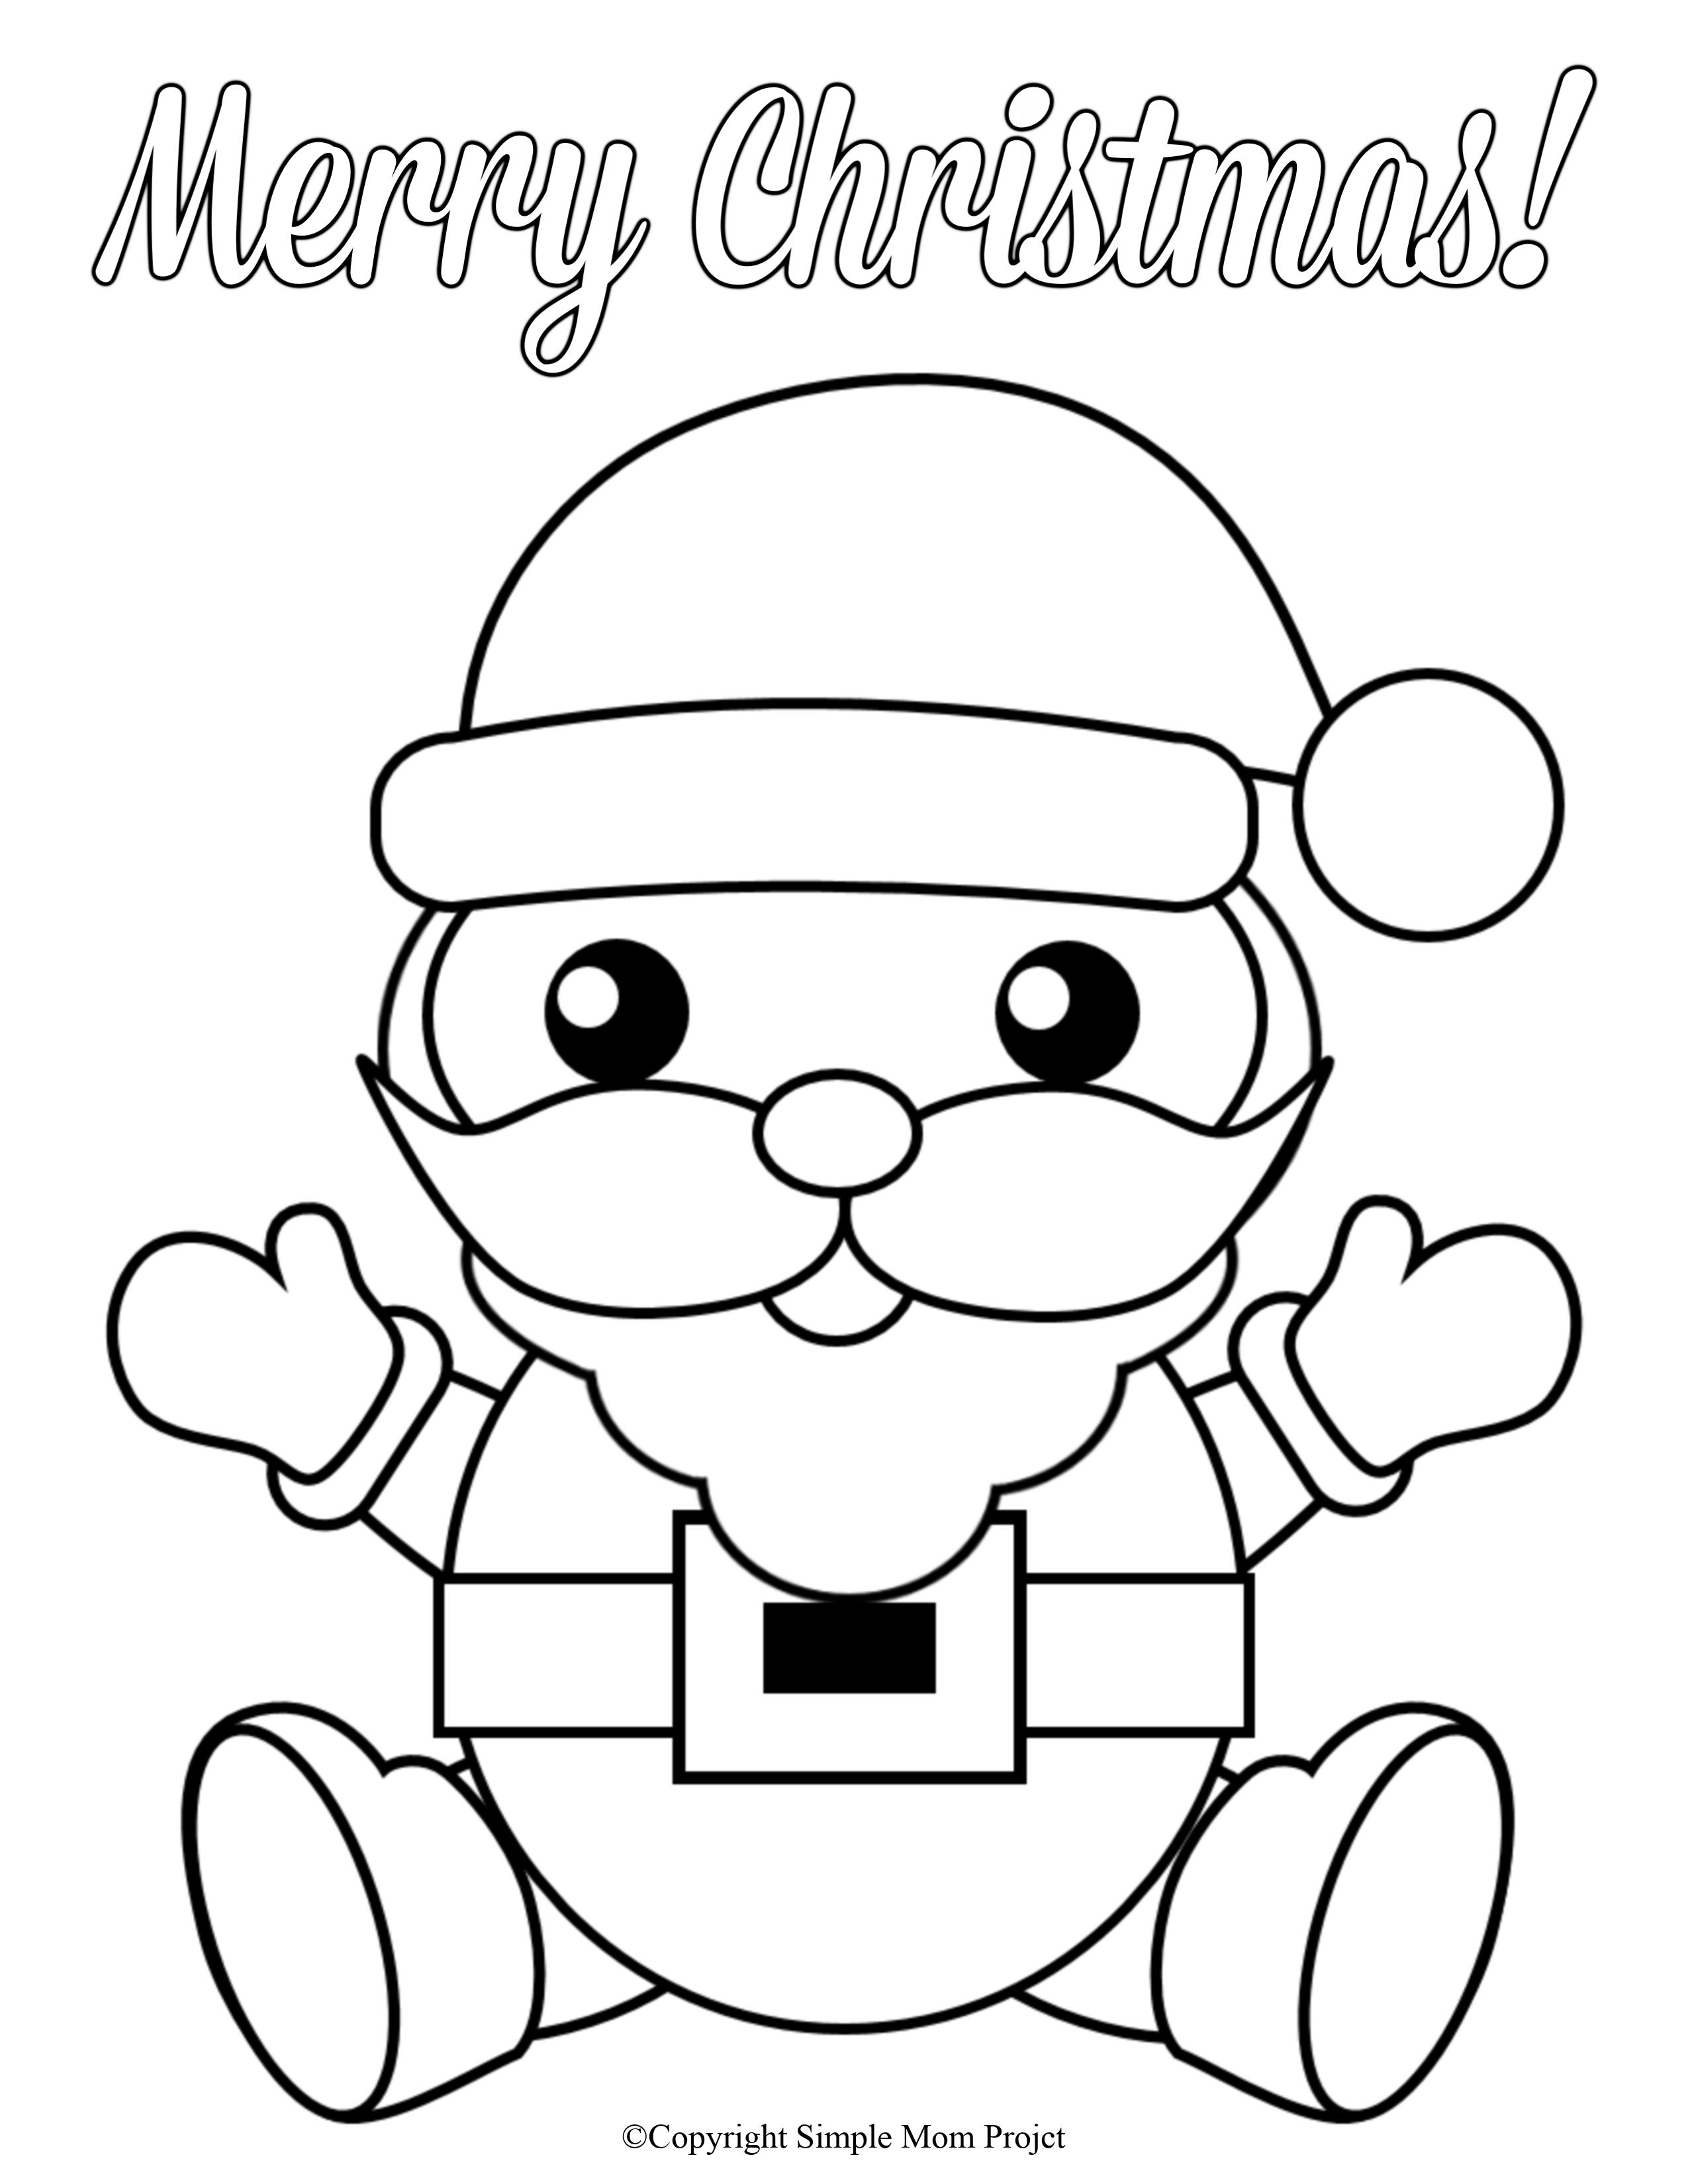 Free Printable Christmas Coloring Sheets For Kids And